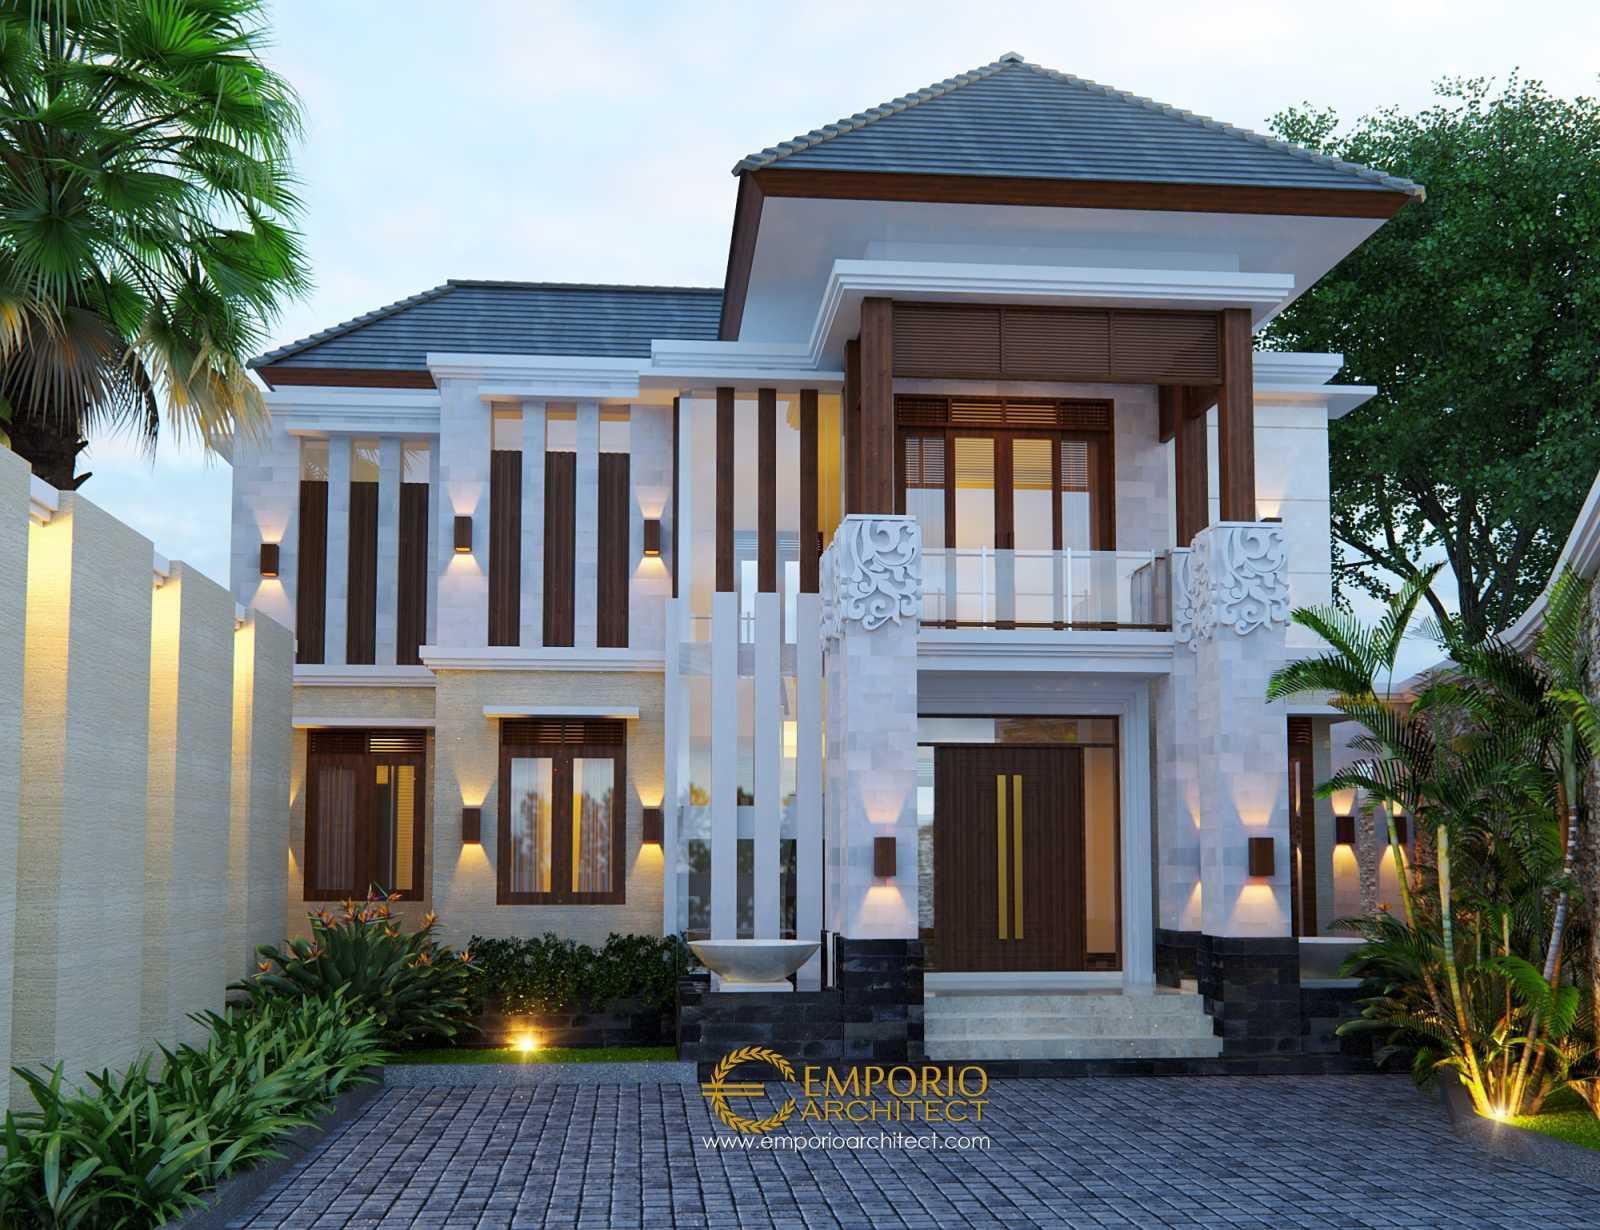 Emporio Architect Desain Rumah Villa Bali Tropis 471  @ Bandung Bandung, Kota Bandung, Jawa Barat, Indonesia Bandung, Kota Bandung, Jawa Barat, Indonesia Emporio-Architect-Desain-Rumah-Modern-Tropis-428-Bandung Modern 78174